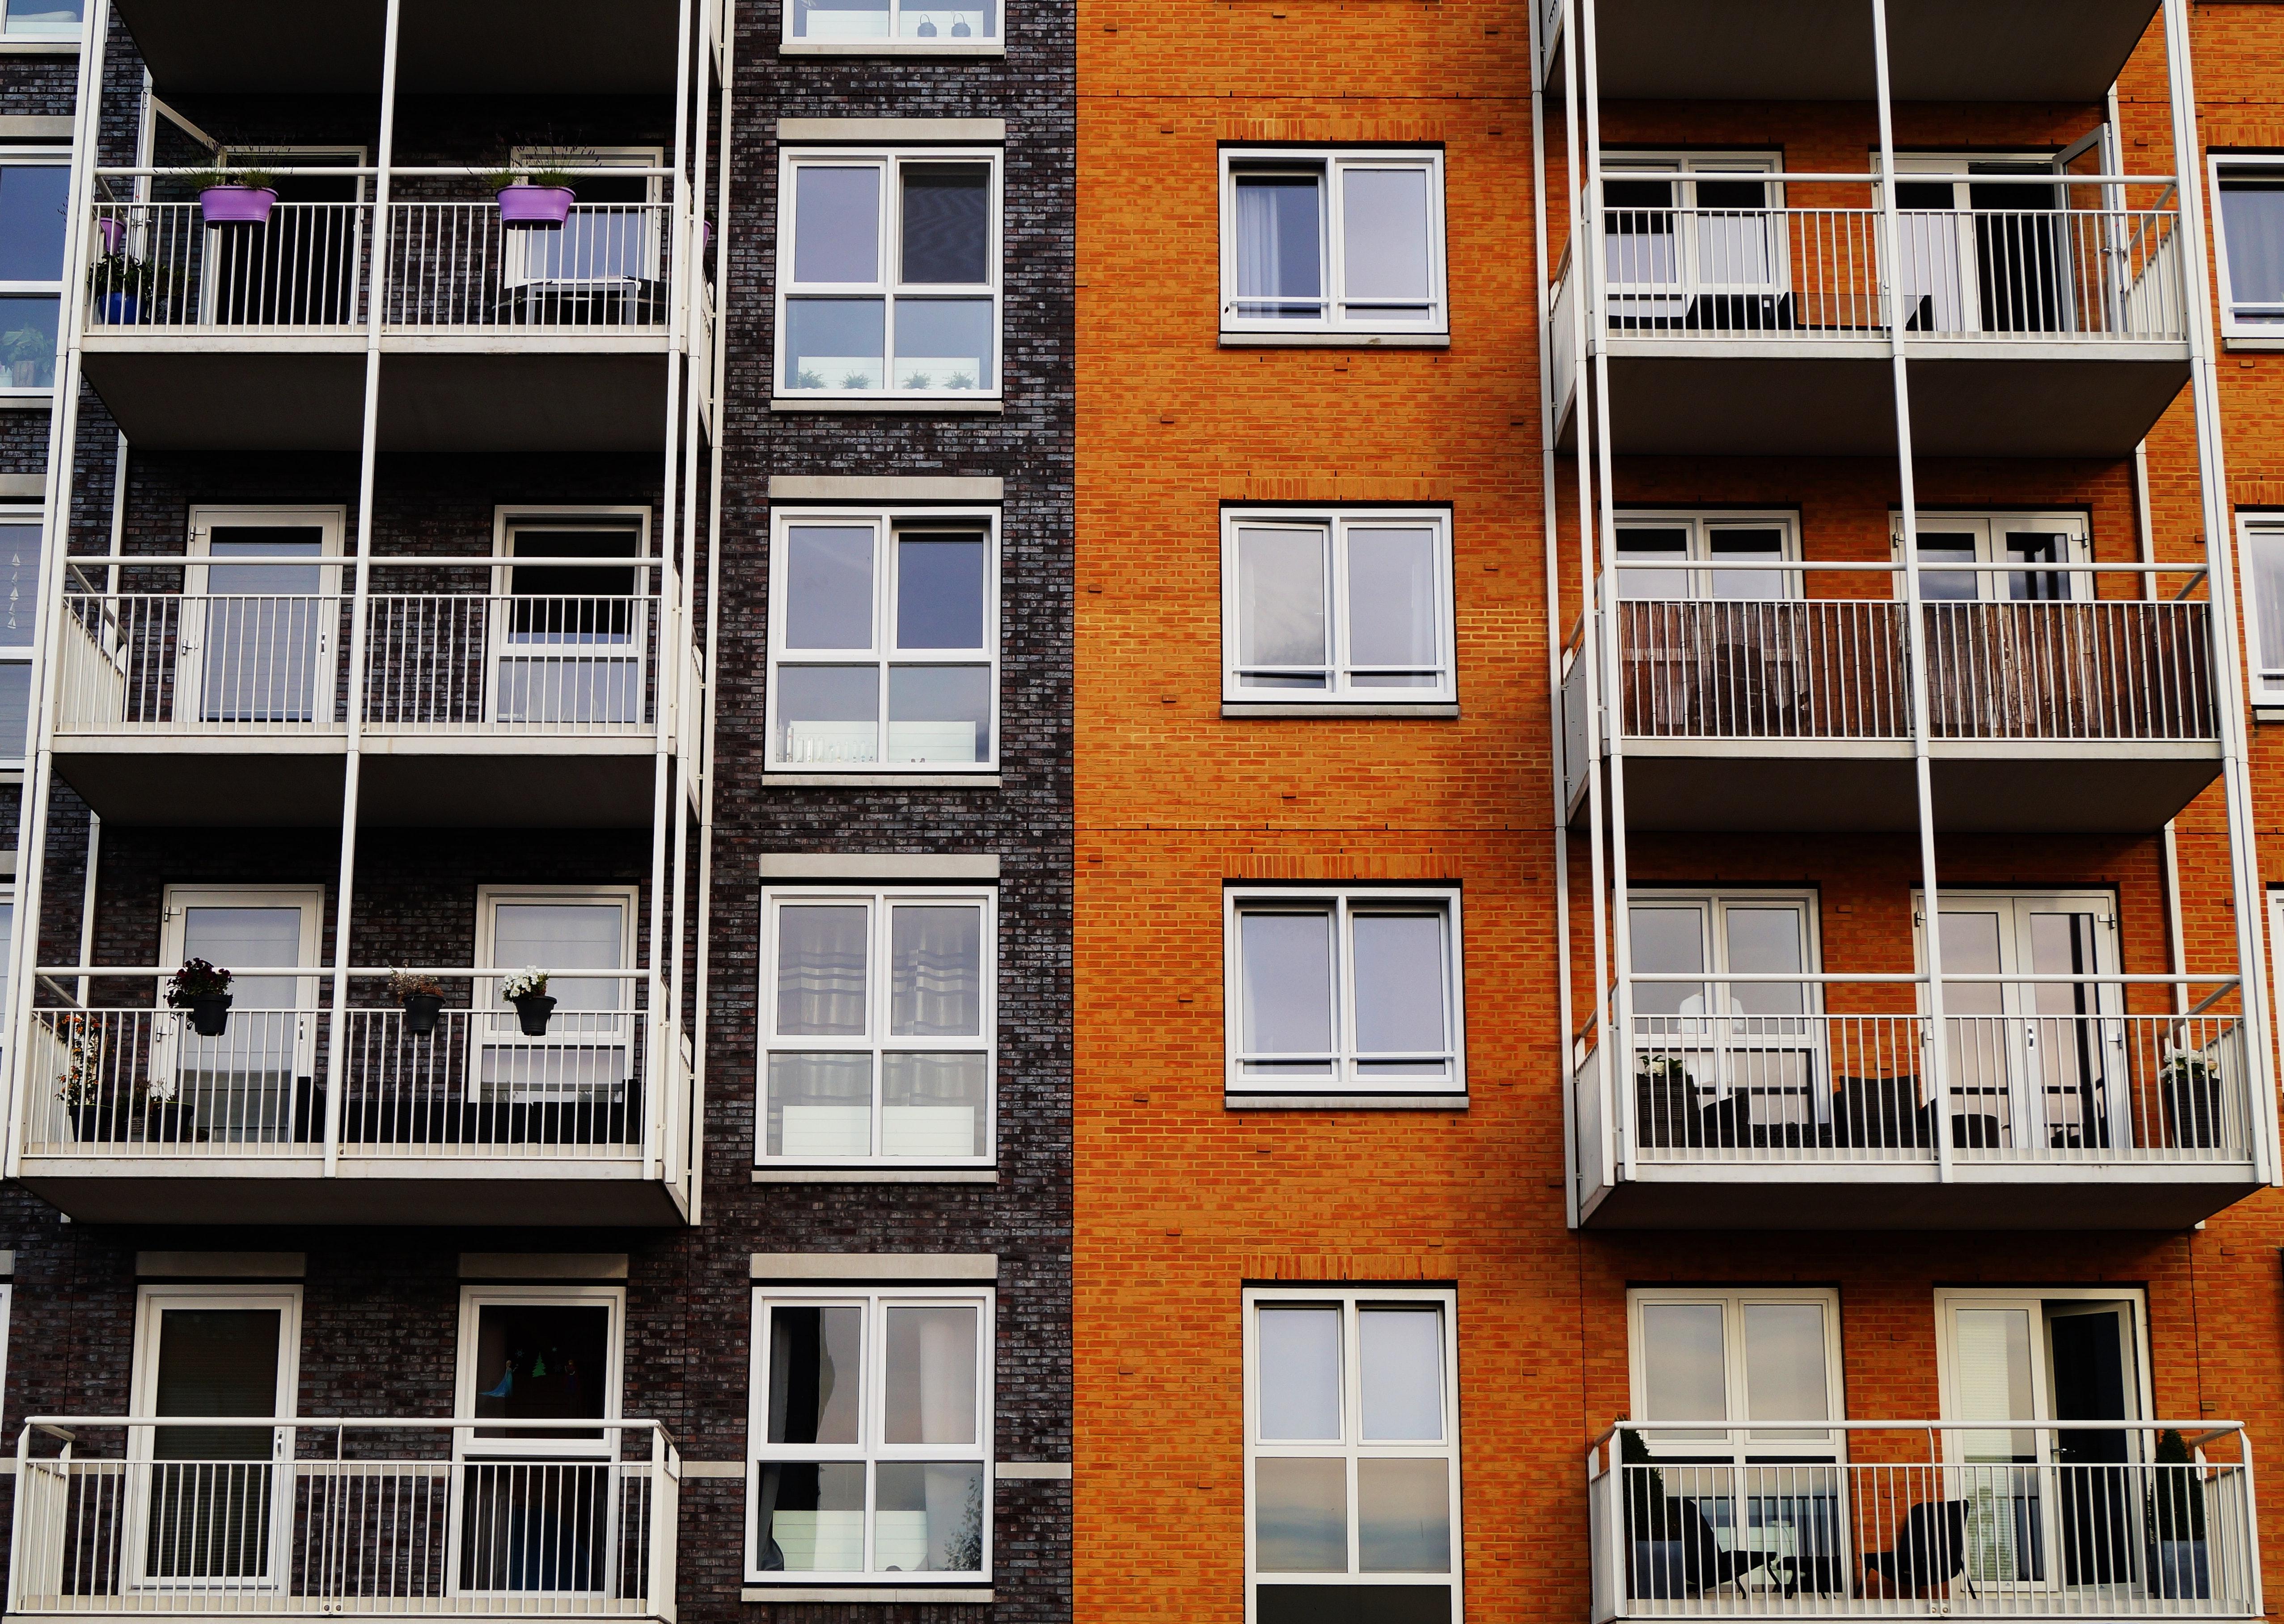 Apartment Pictures · Pexels · Free Stock Photos